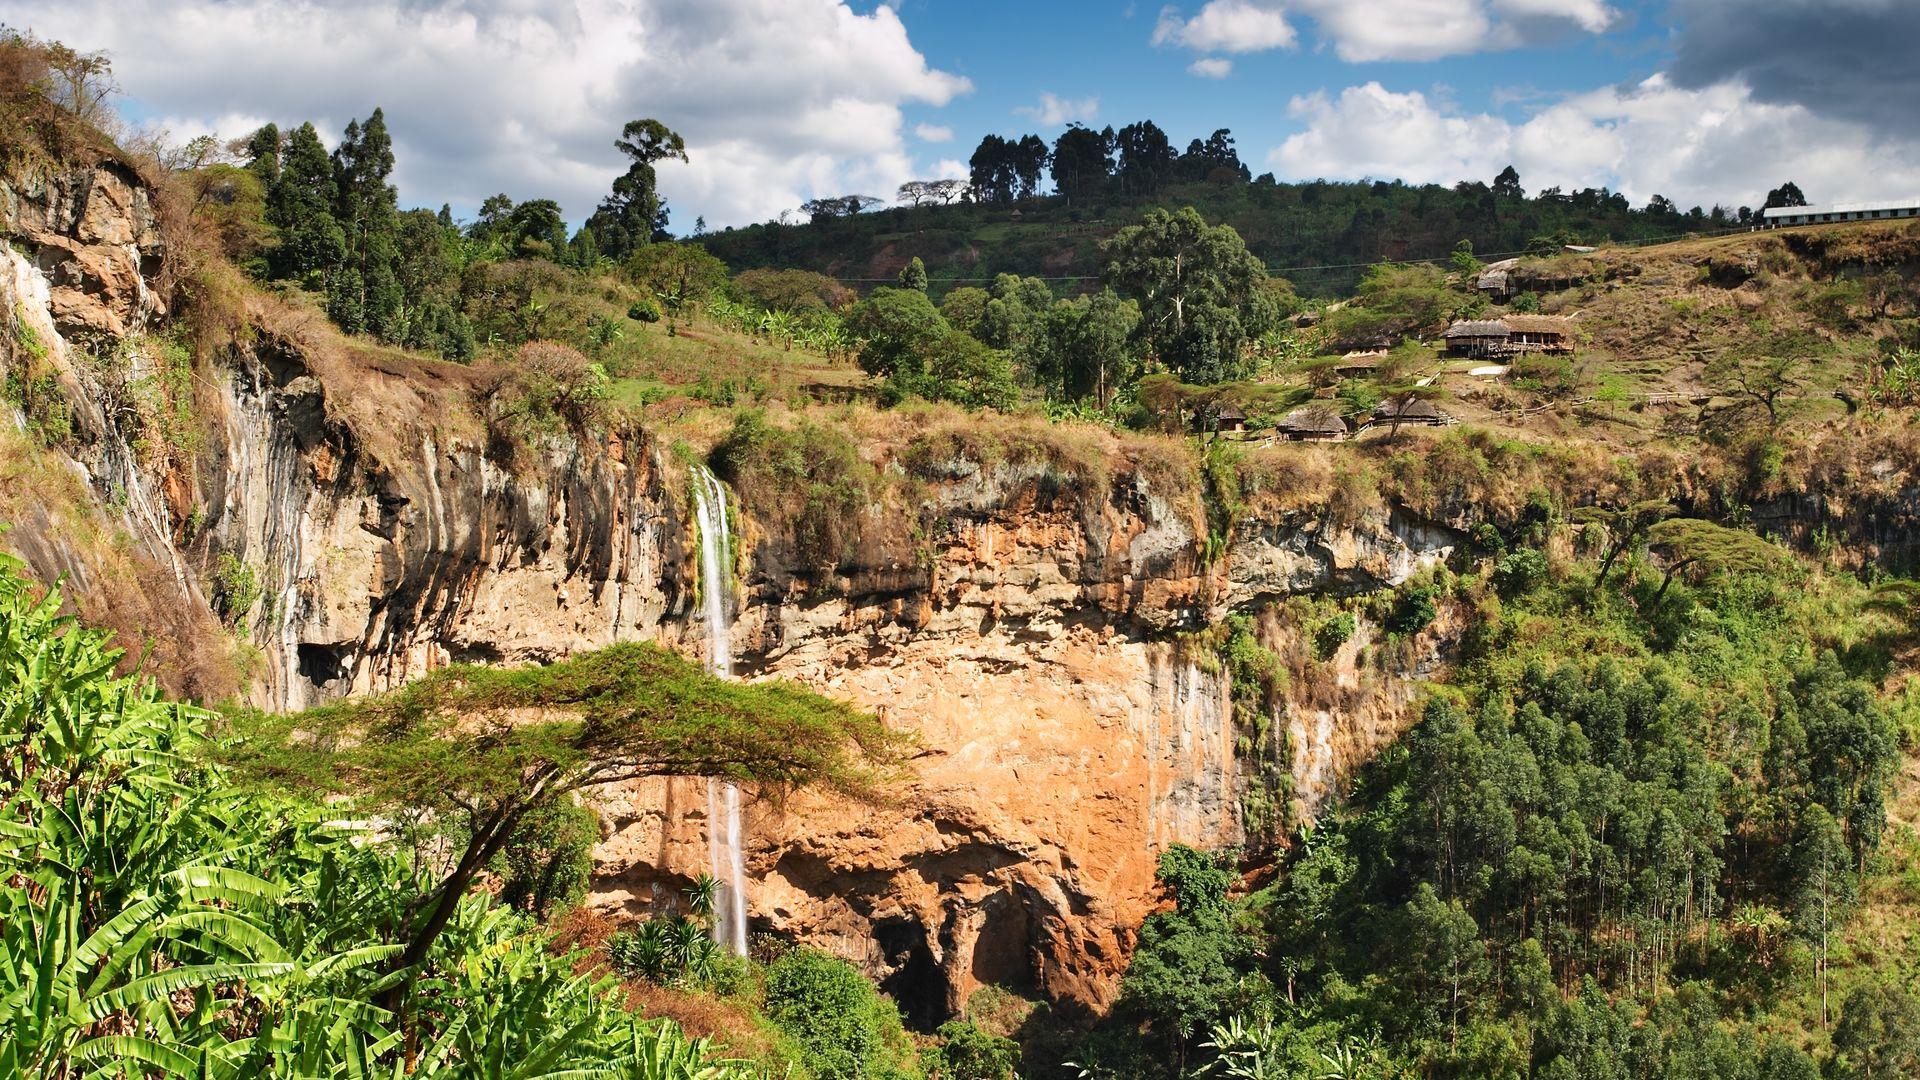 Rondreis Oeganda - Oeganda rondreis met Matoke Tours